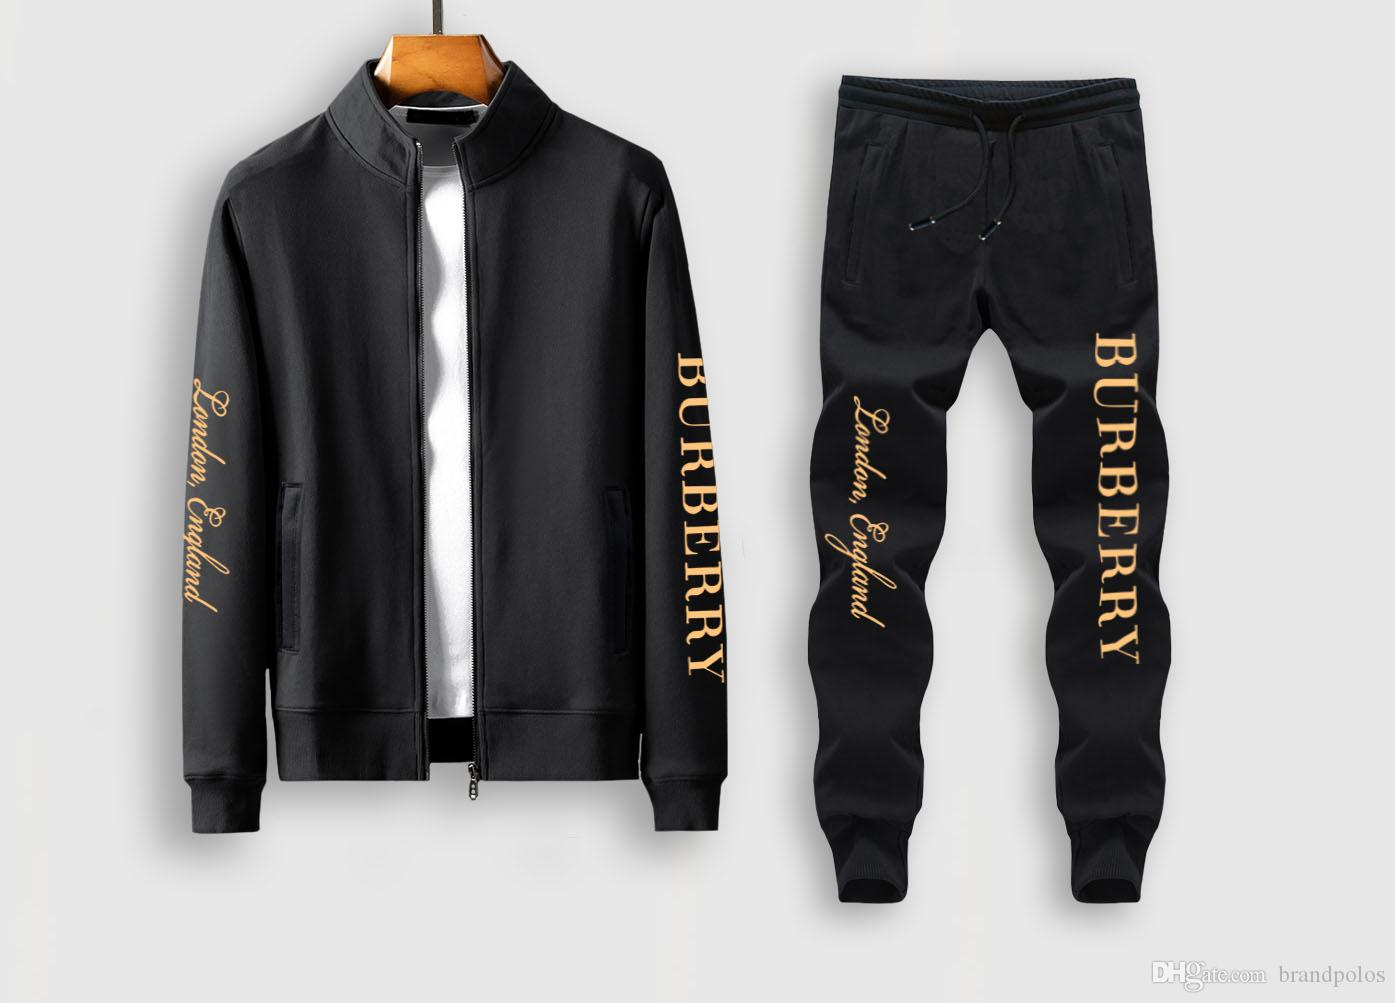 Designer Sportswear Carta Imprimir Jogging Suit manga comprida Casal Casual Medusa Sportswear Set de Homens Autumn Paris